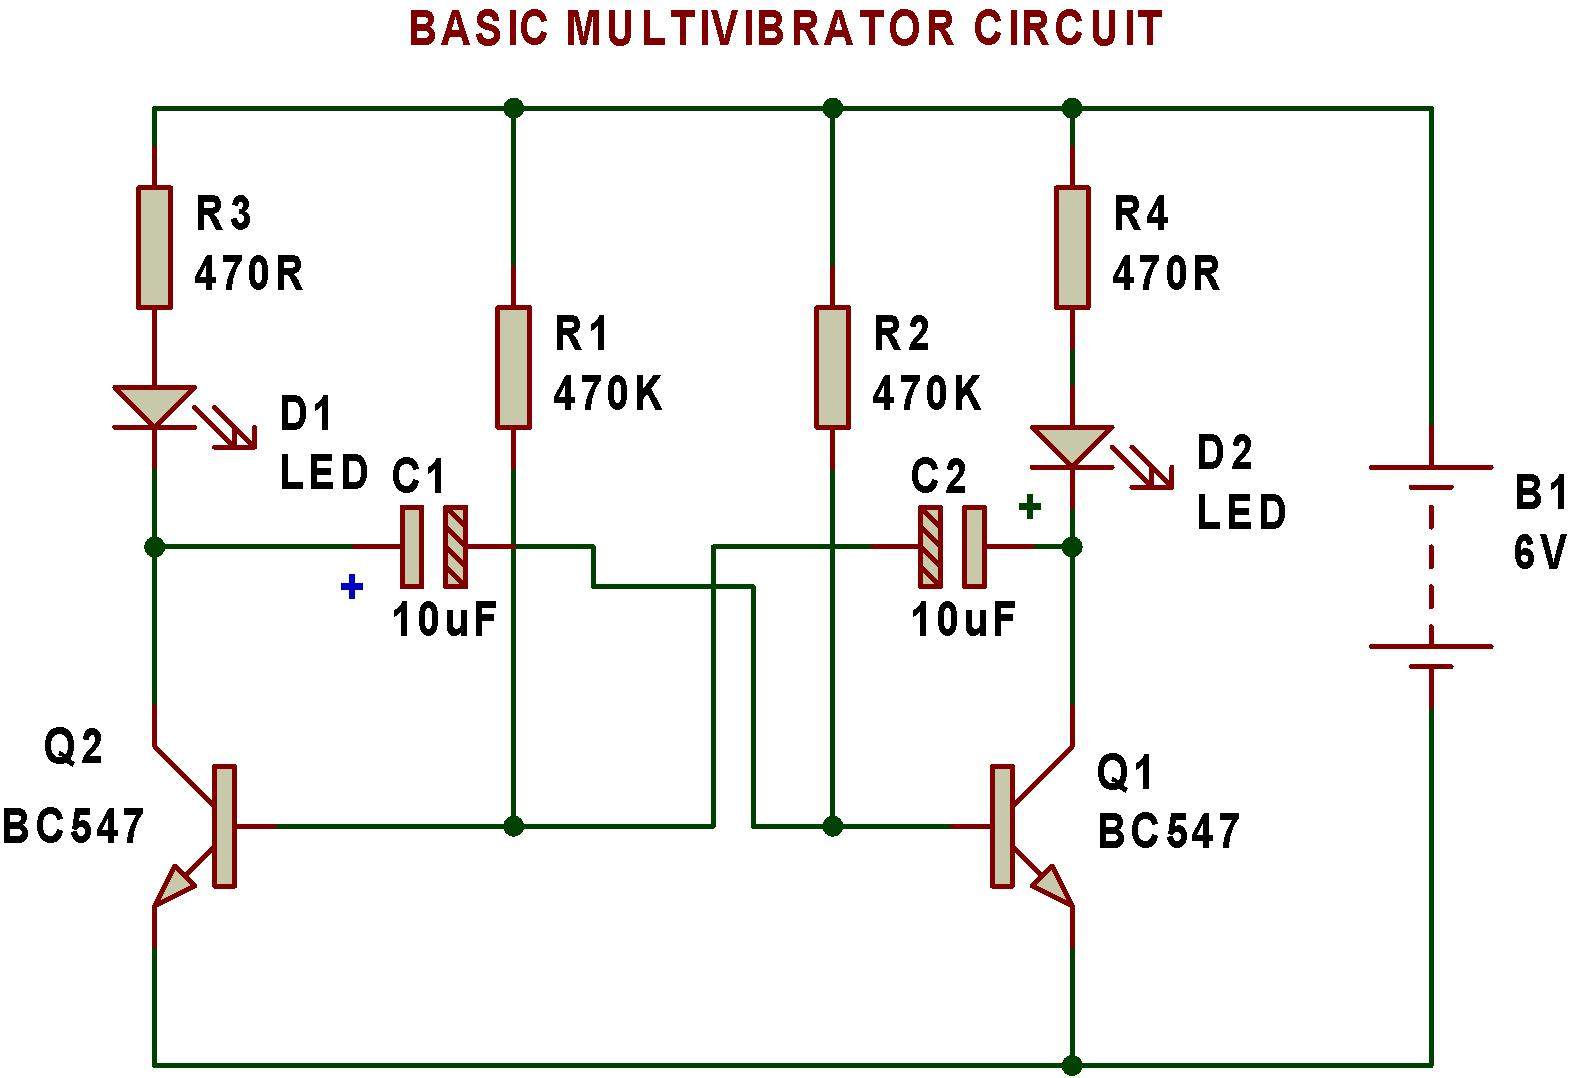 led strobe light circuit diagram toilet flange multivibrator   buildcircuit - electronics